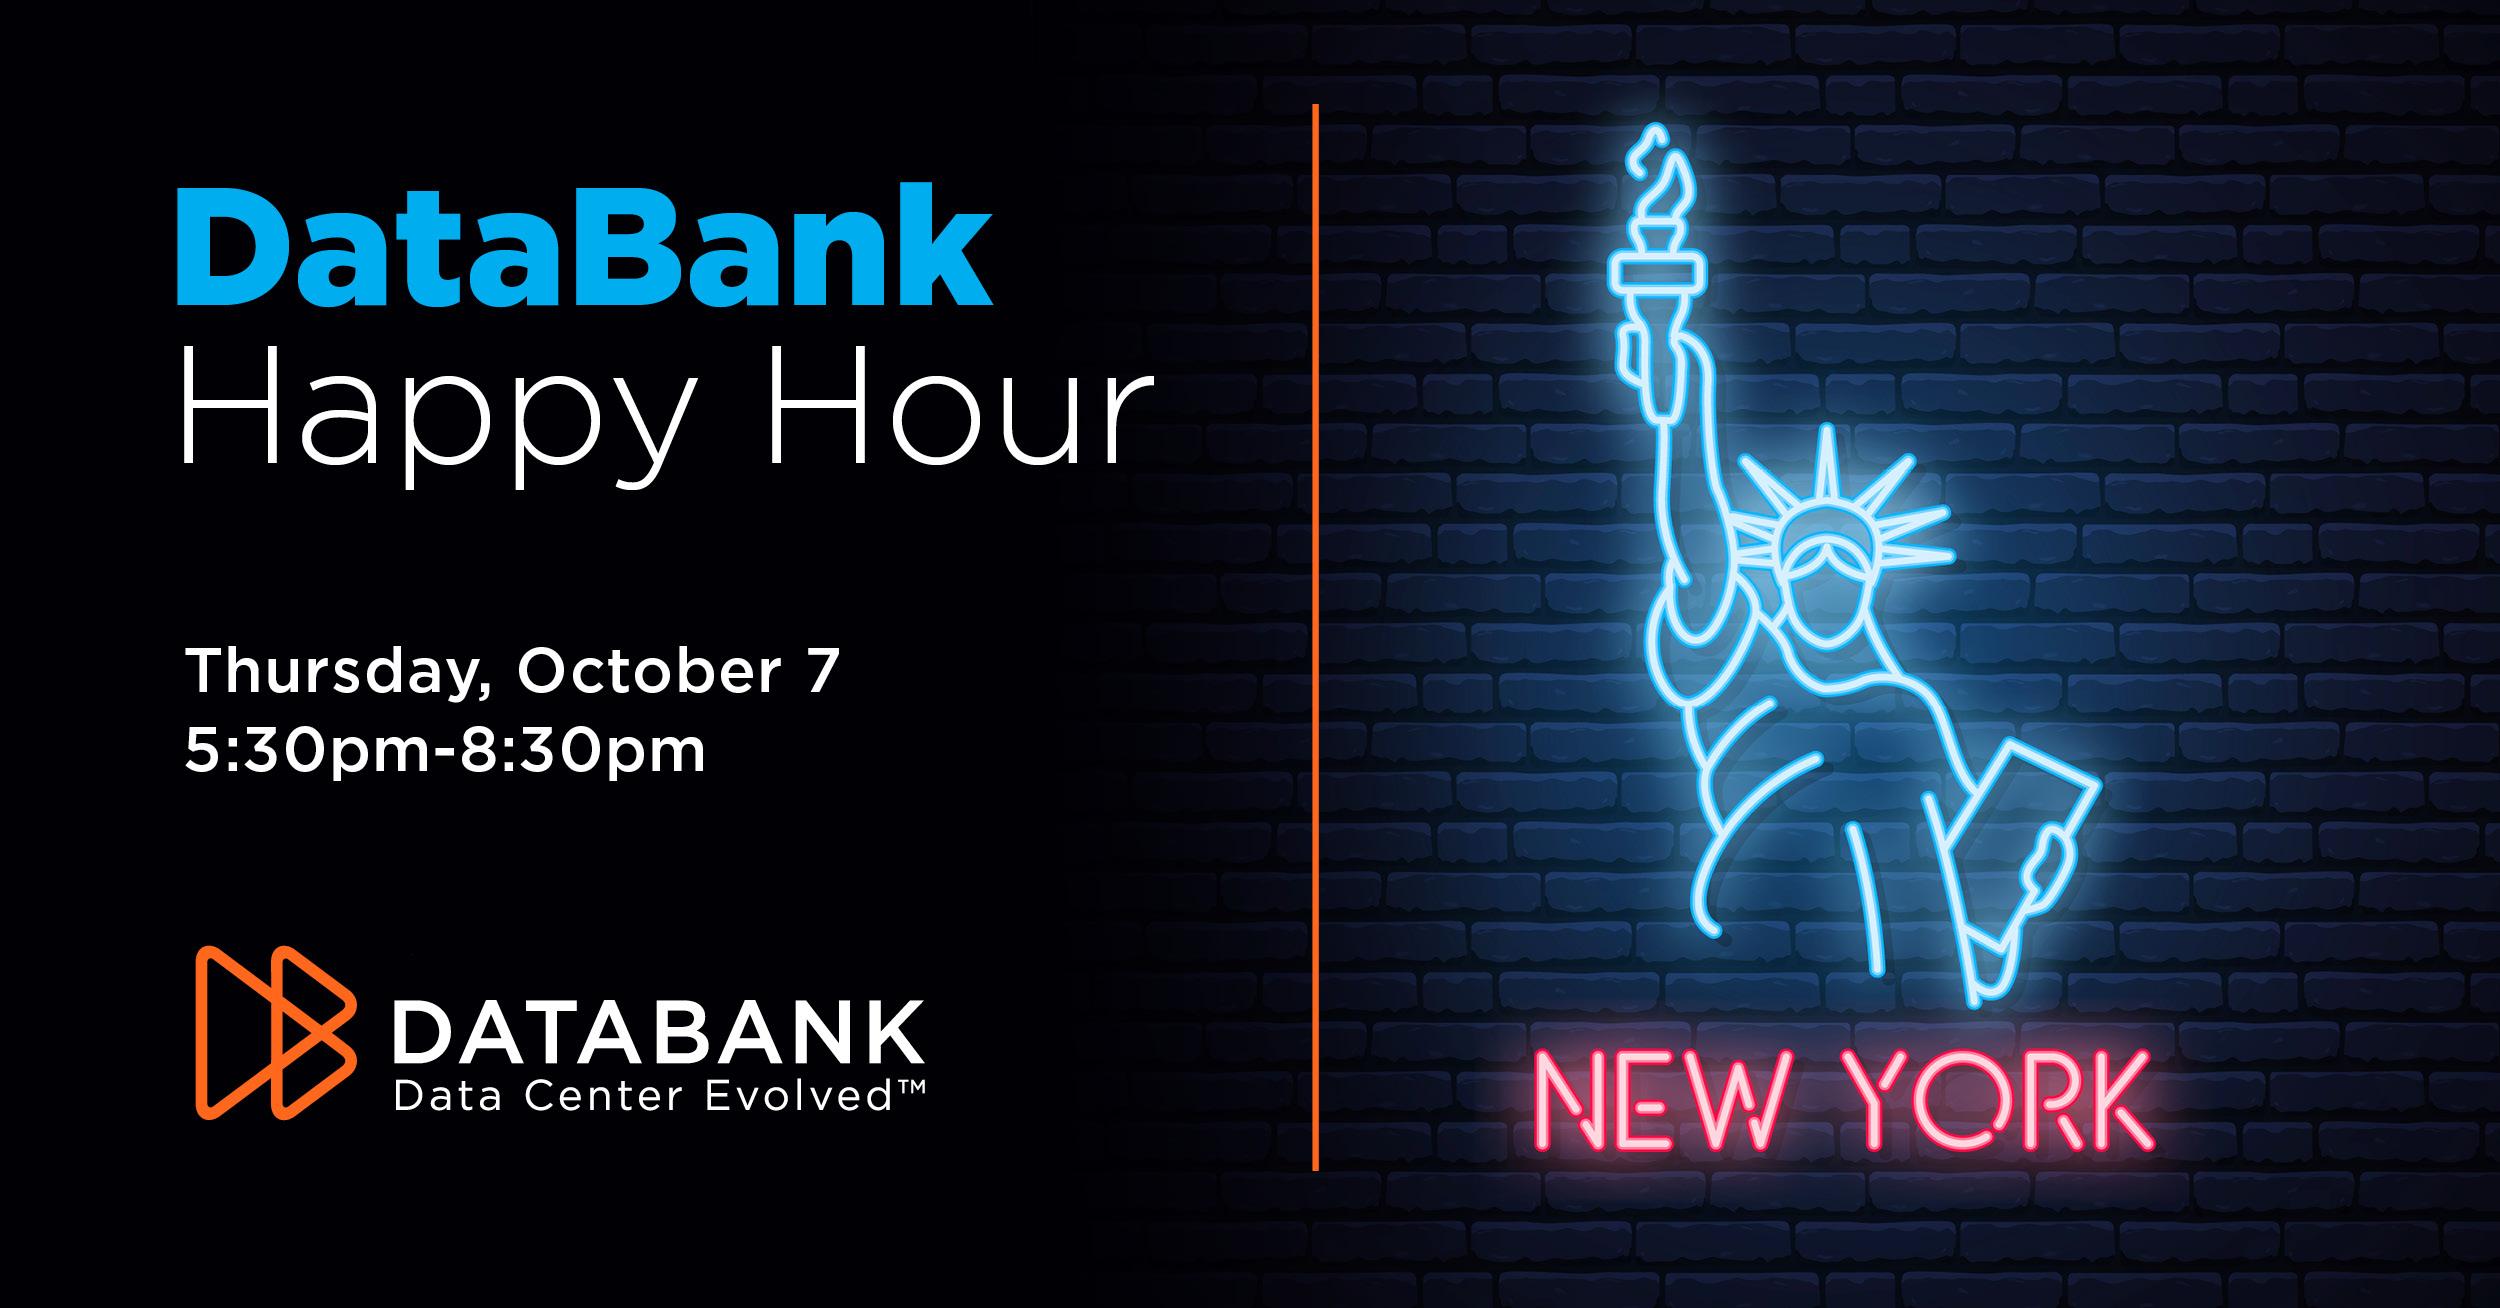 DataBank's New York City Happy Hour